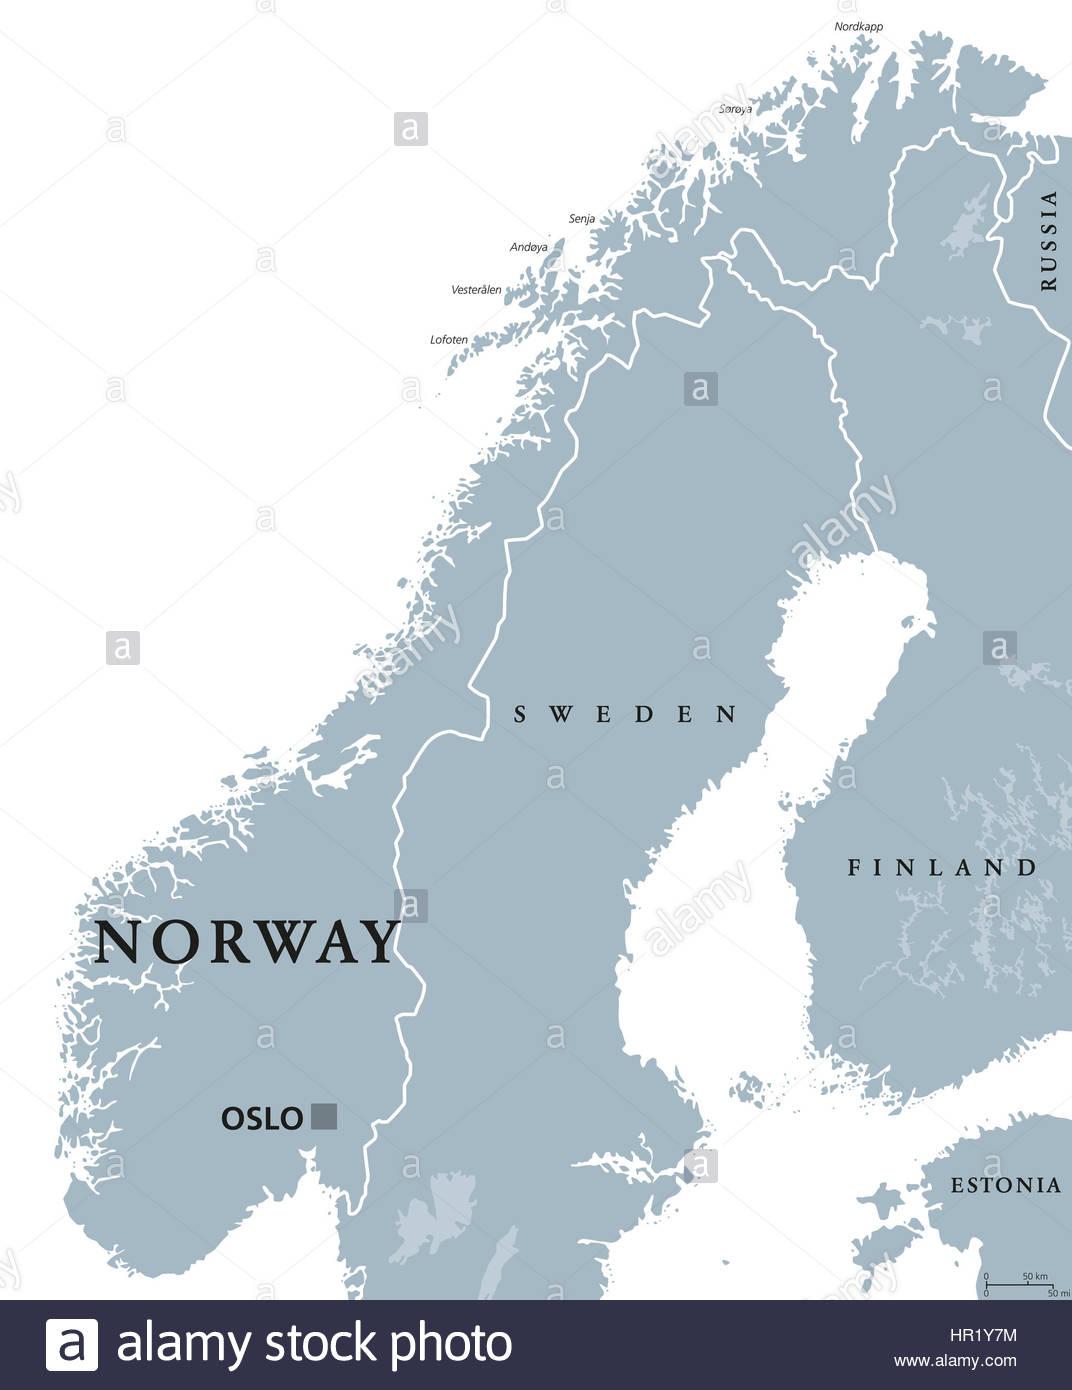 Carte Politique De La Norvège Avec Oslo, Capitale Des destiné Carte Europe Capitale